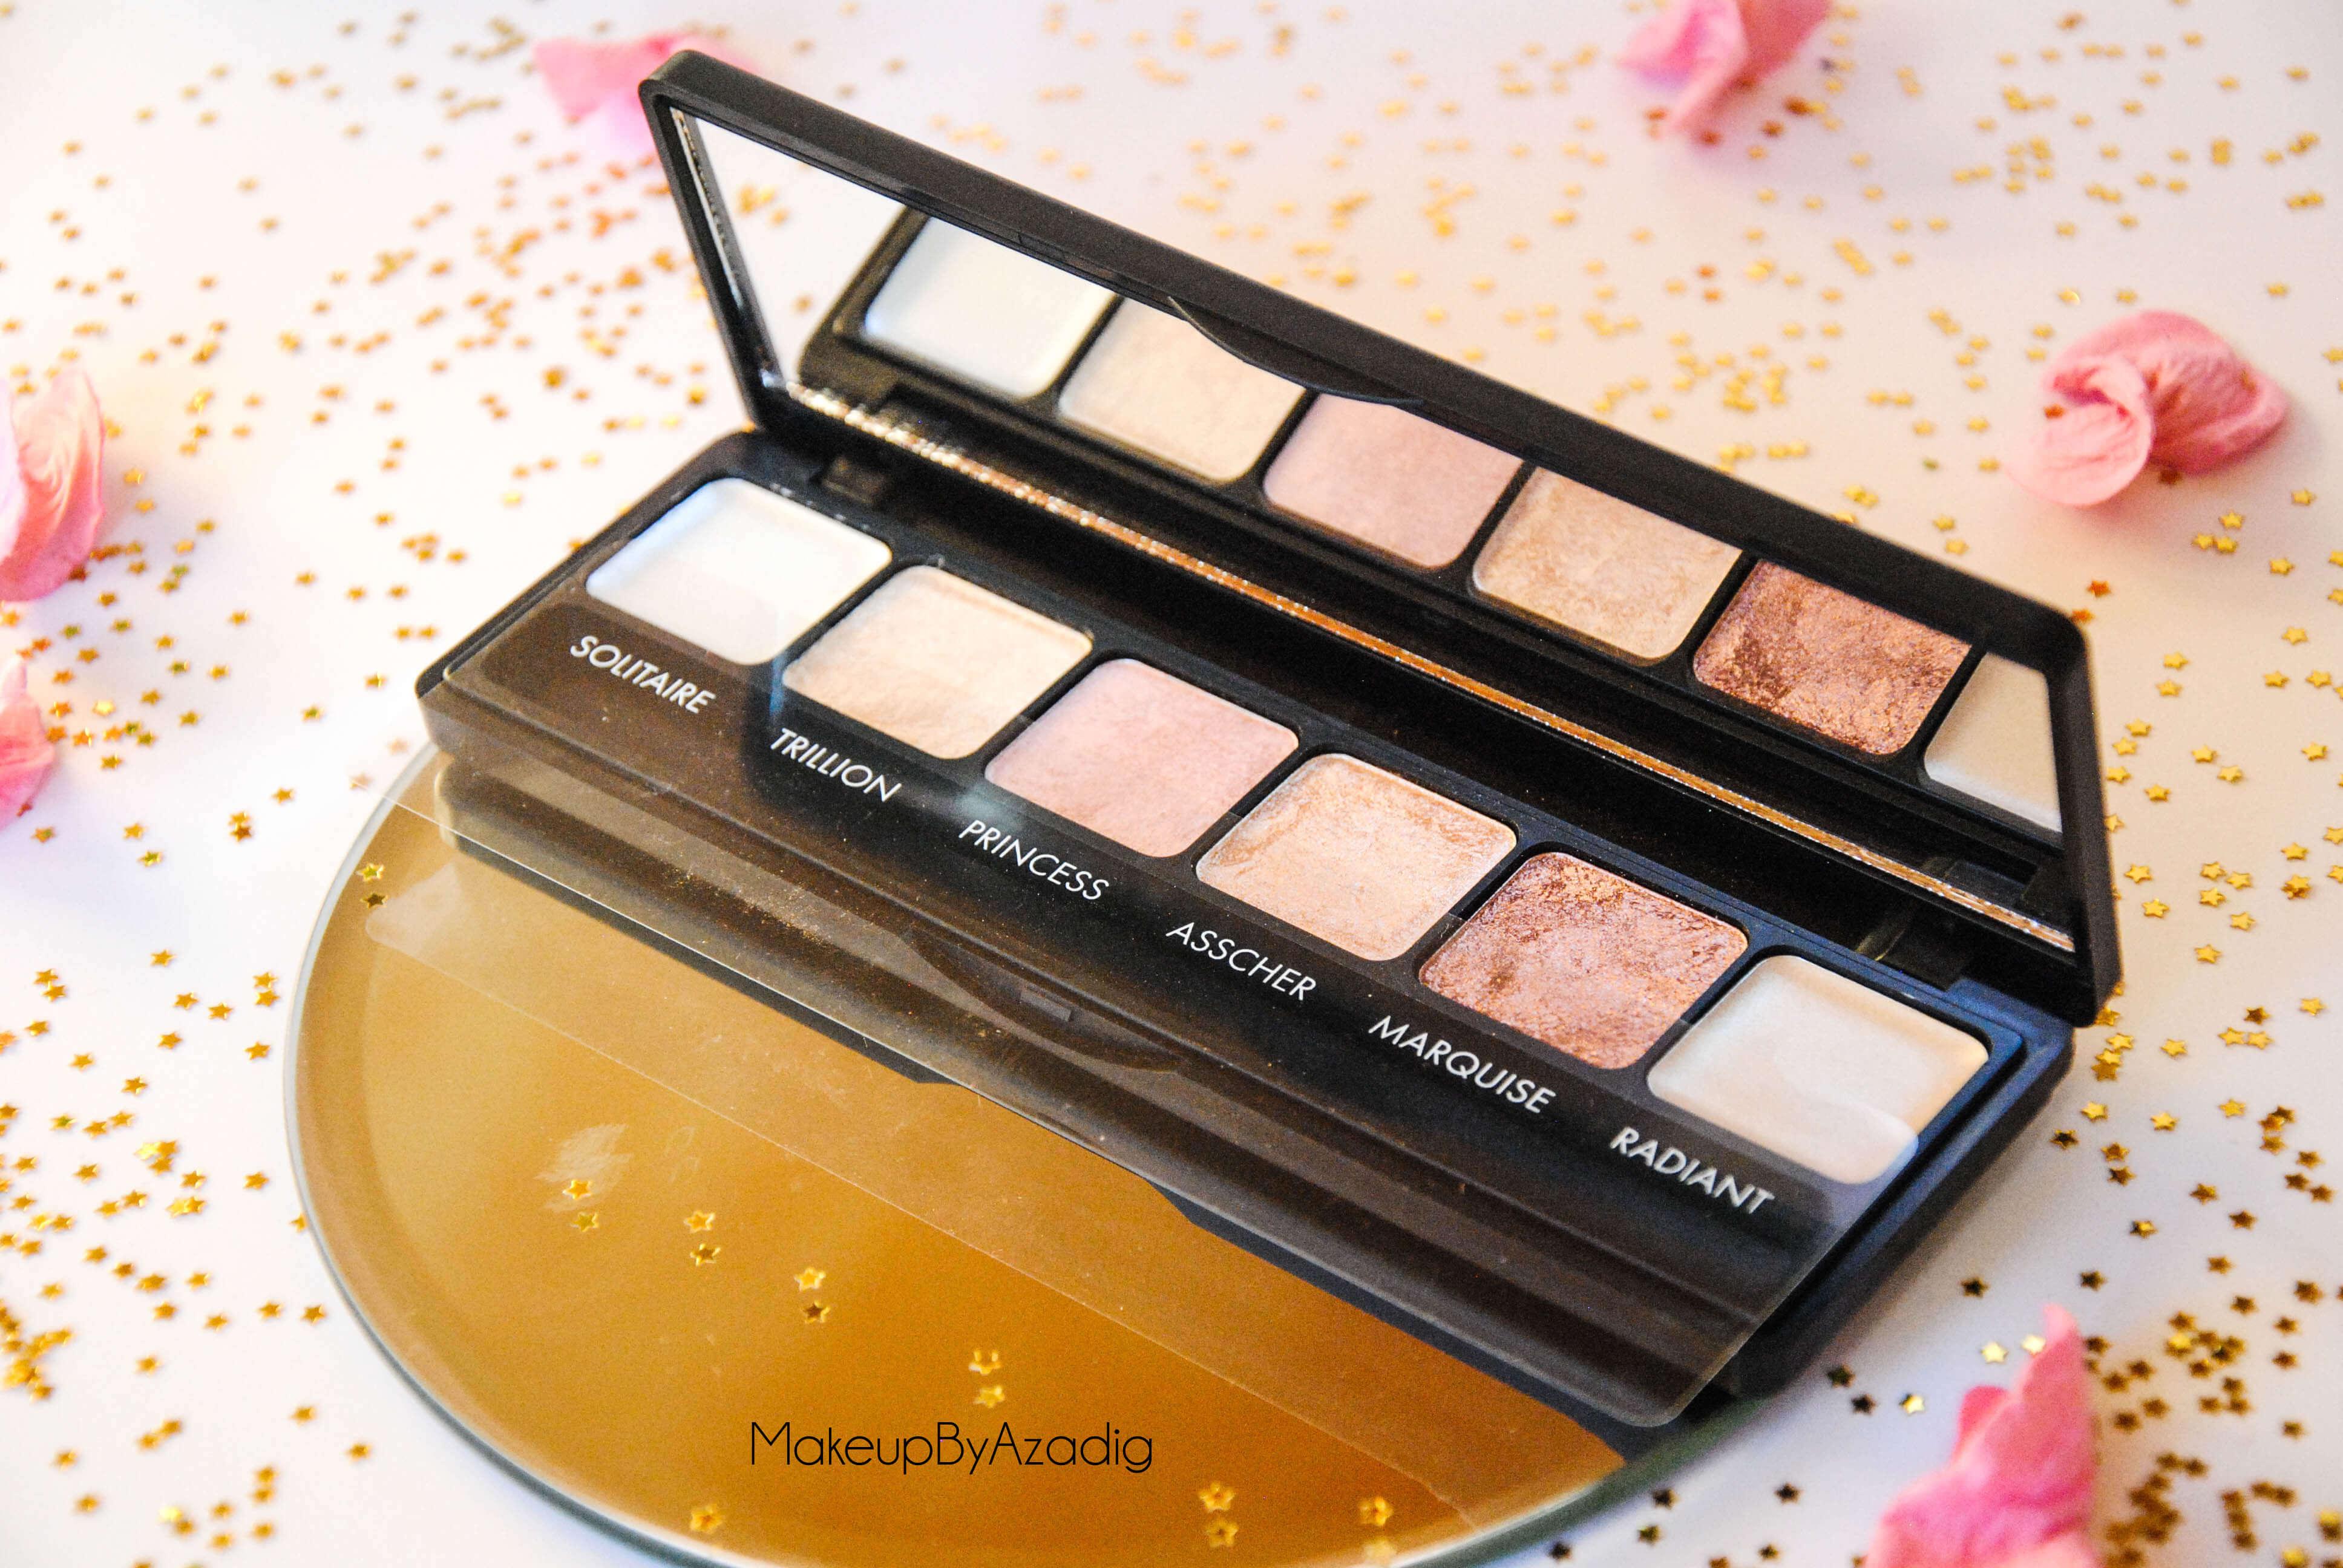 palette-eyeshadow-sleek-makeup-diamonds-in-the-rough-ilust-sephora-paris-makeupbyazadig-noel-code-promo-avis-prix-noms